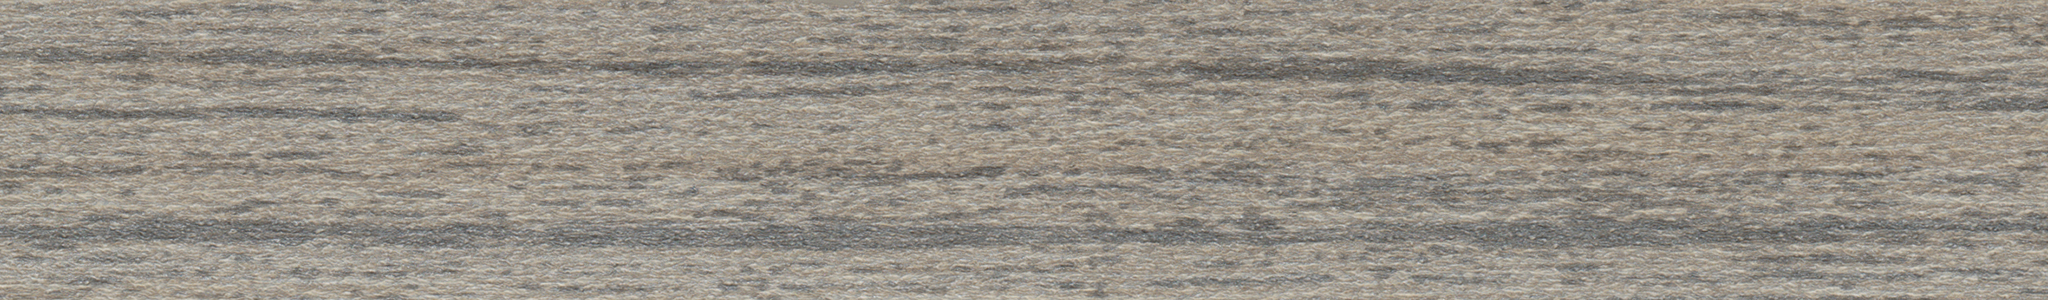 HD 293047 Chant ABS Borneo Truffe Perle